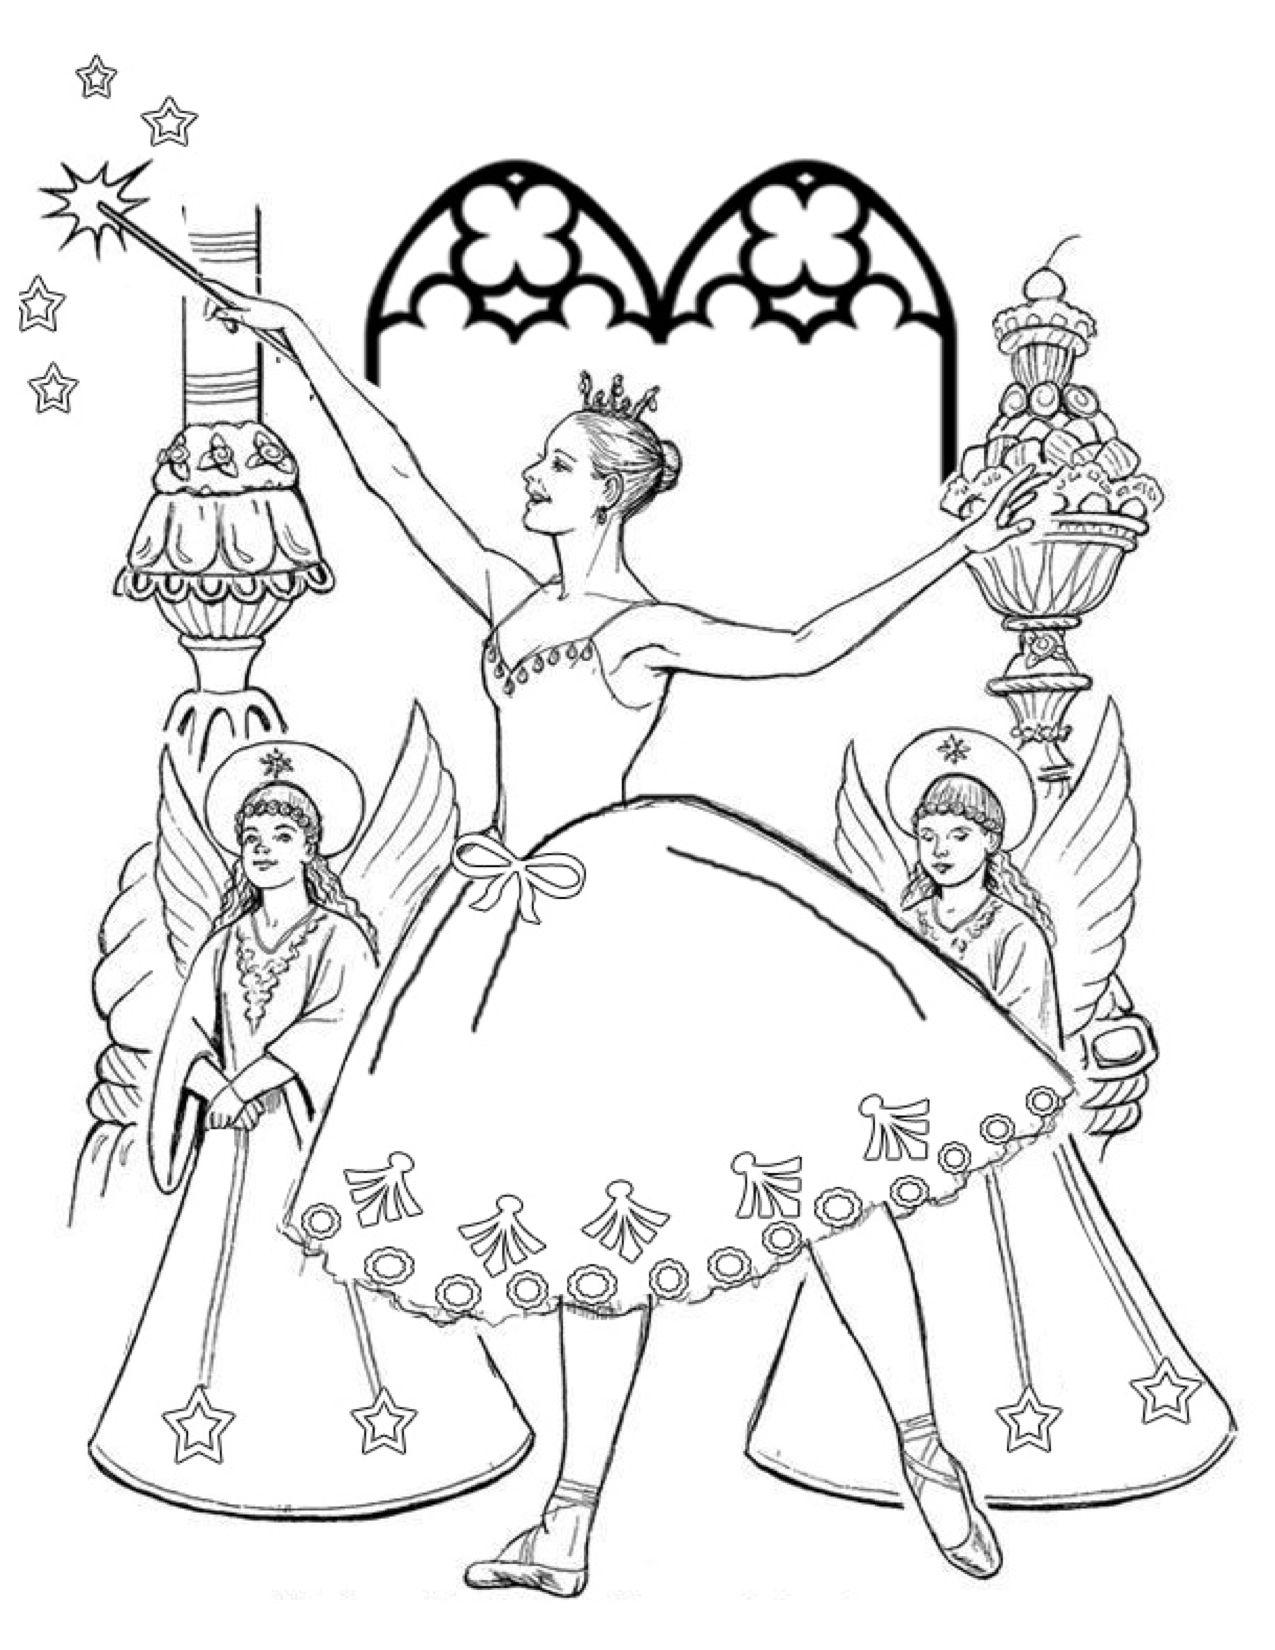 Sugar Plum Fairy Nutcracker Coloring Page Fairy coloring